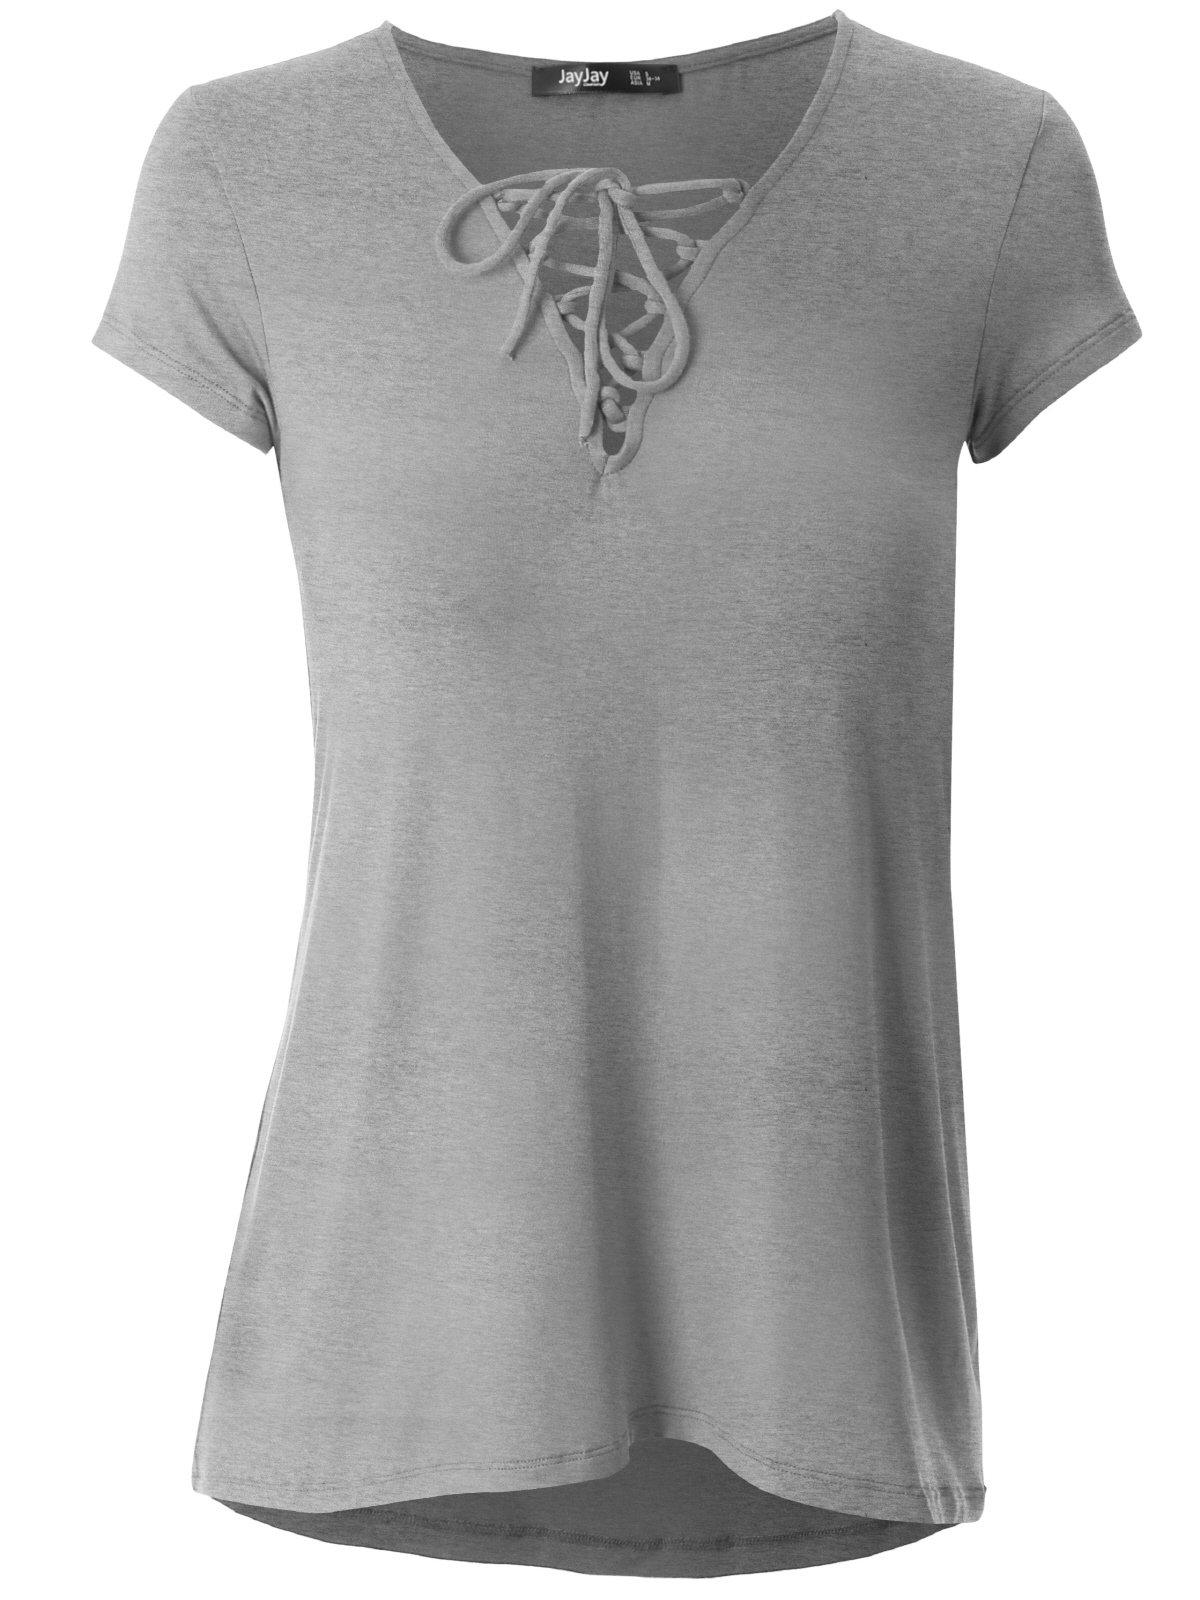 JayJay Women Cute Crisscross Neck Short Sleeve Casual Shirt Top,HeatherGray,3XL